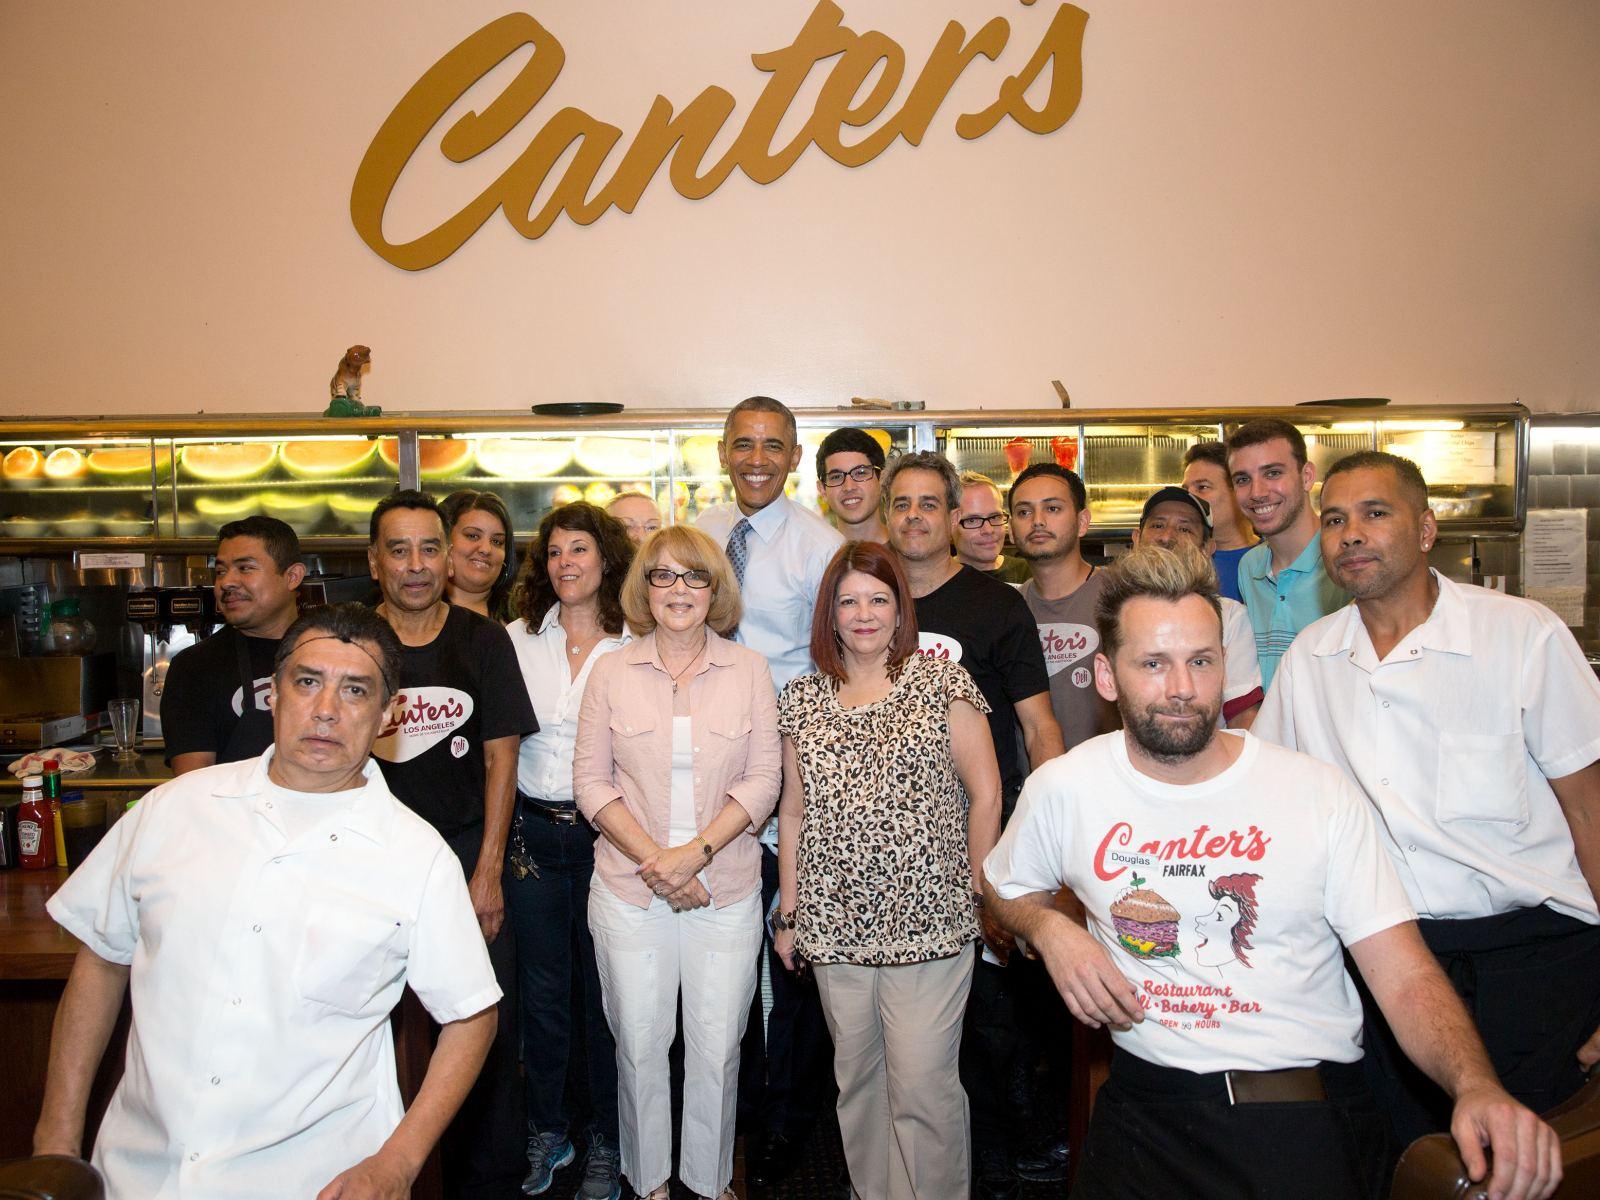 President Barack Obama Canter's Deli group photo